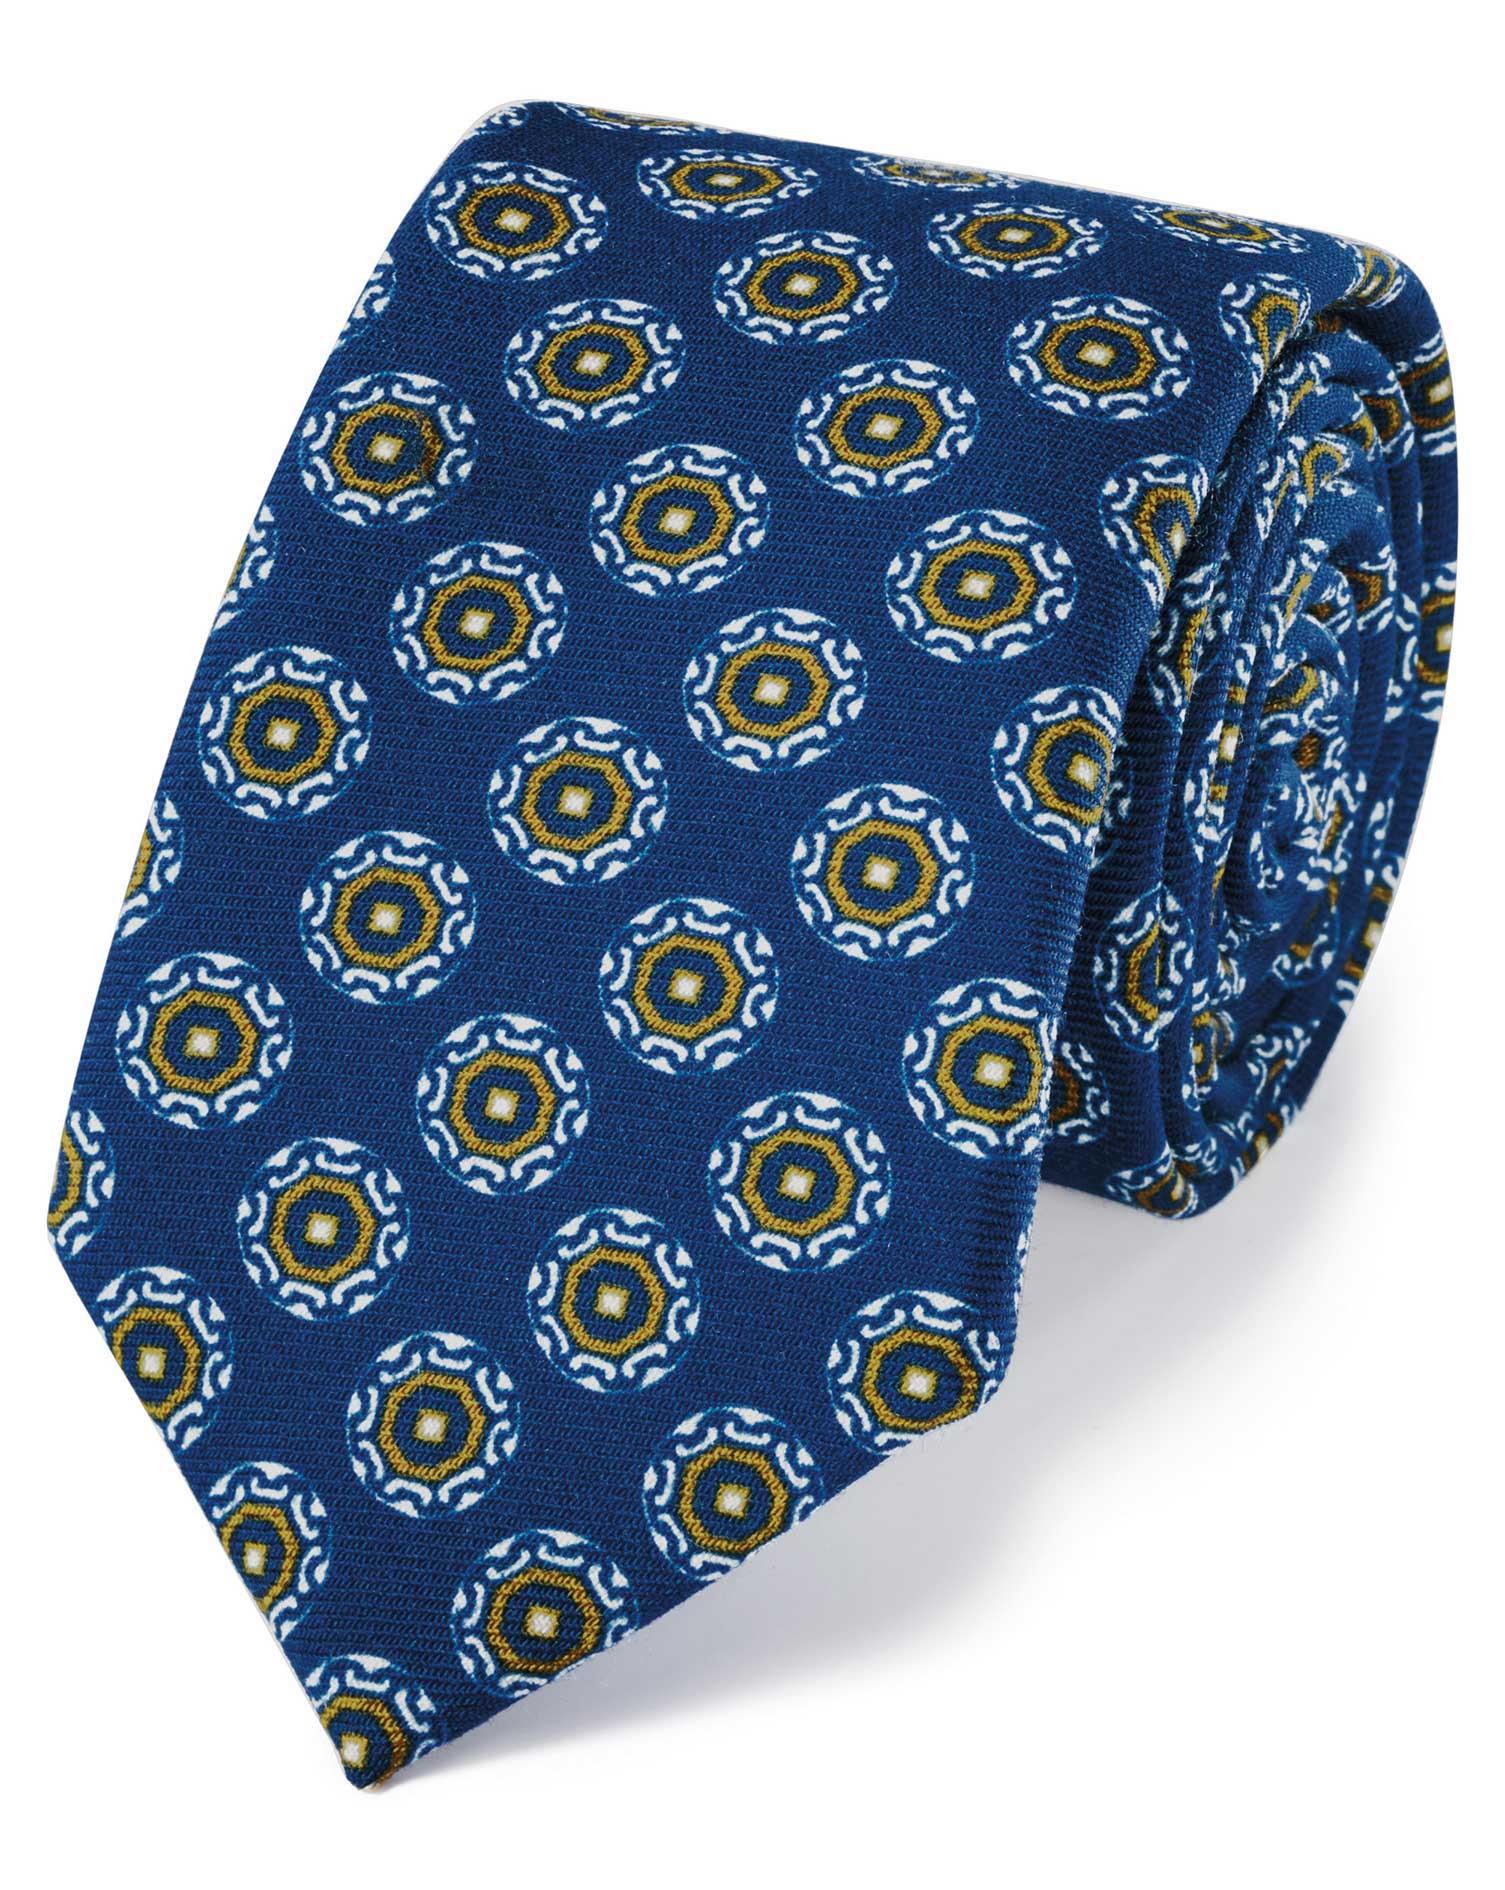 cravate de luxe bleu roi en laine italienne avec imprim charles tyrwhitt. Black Bedroom Furniture Sets. Home Design Ideas